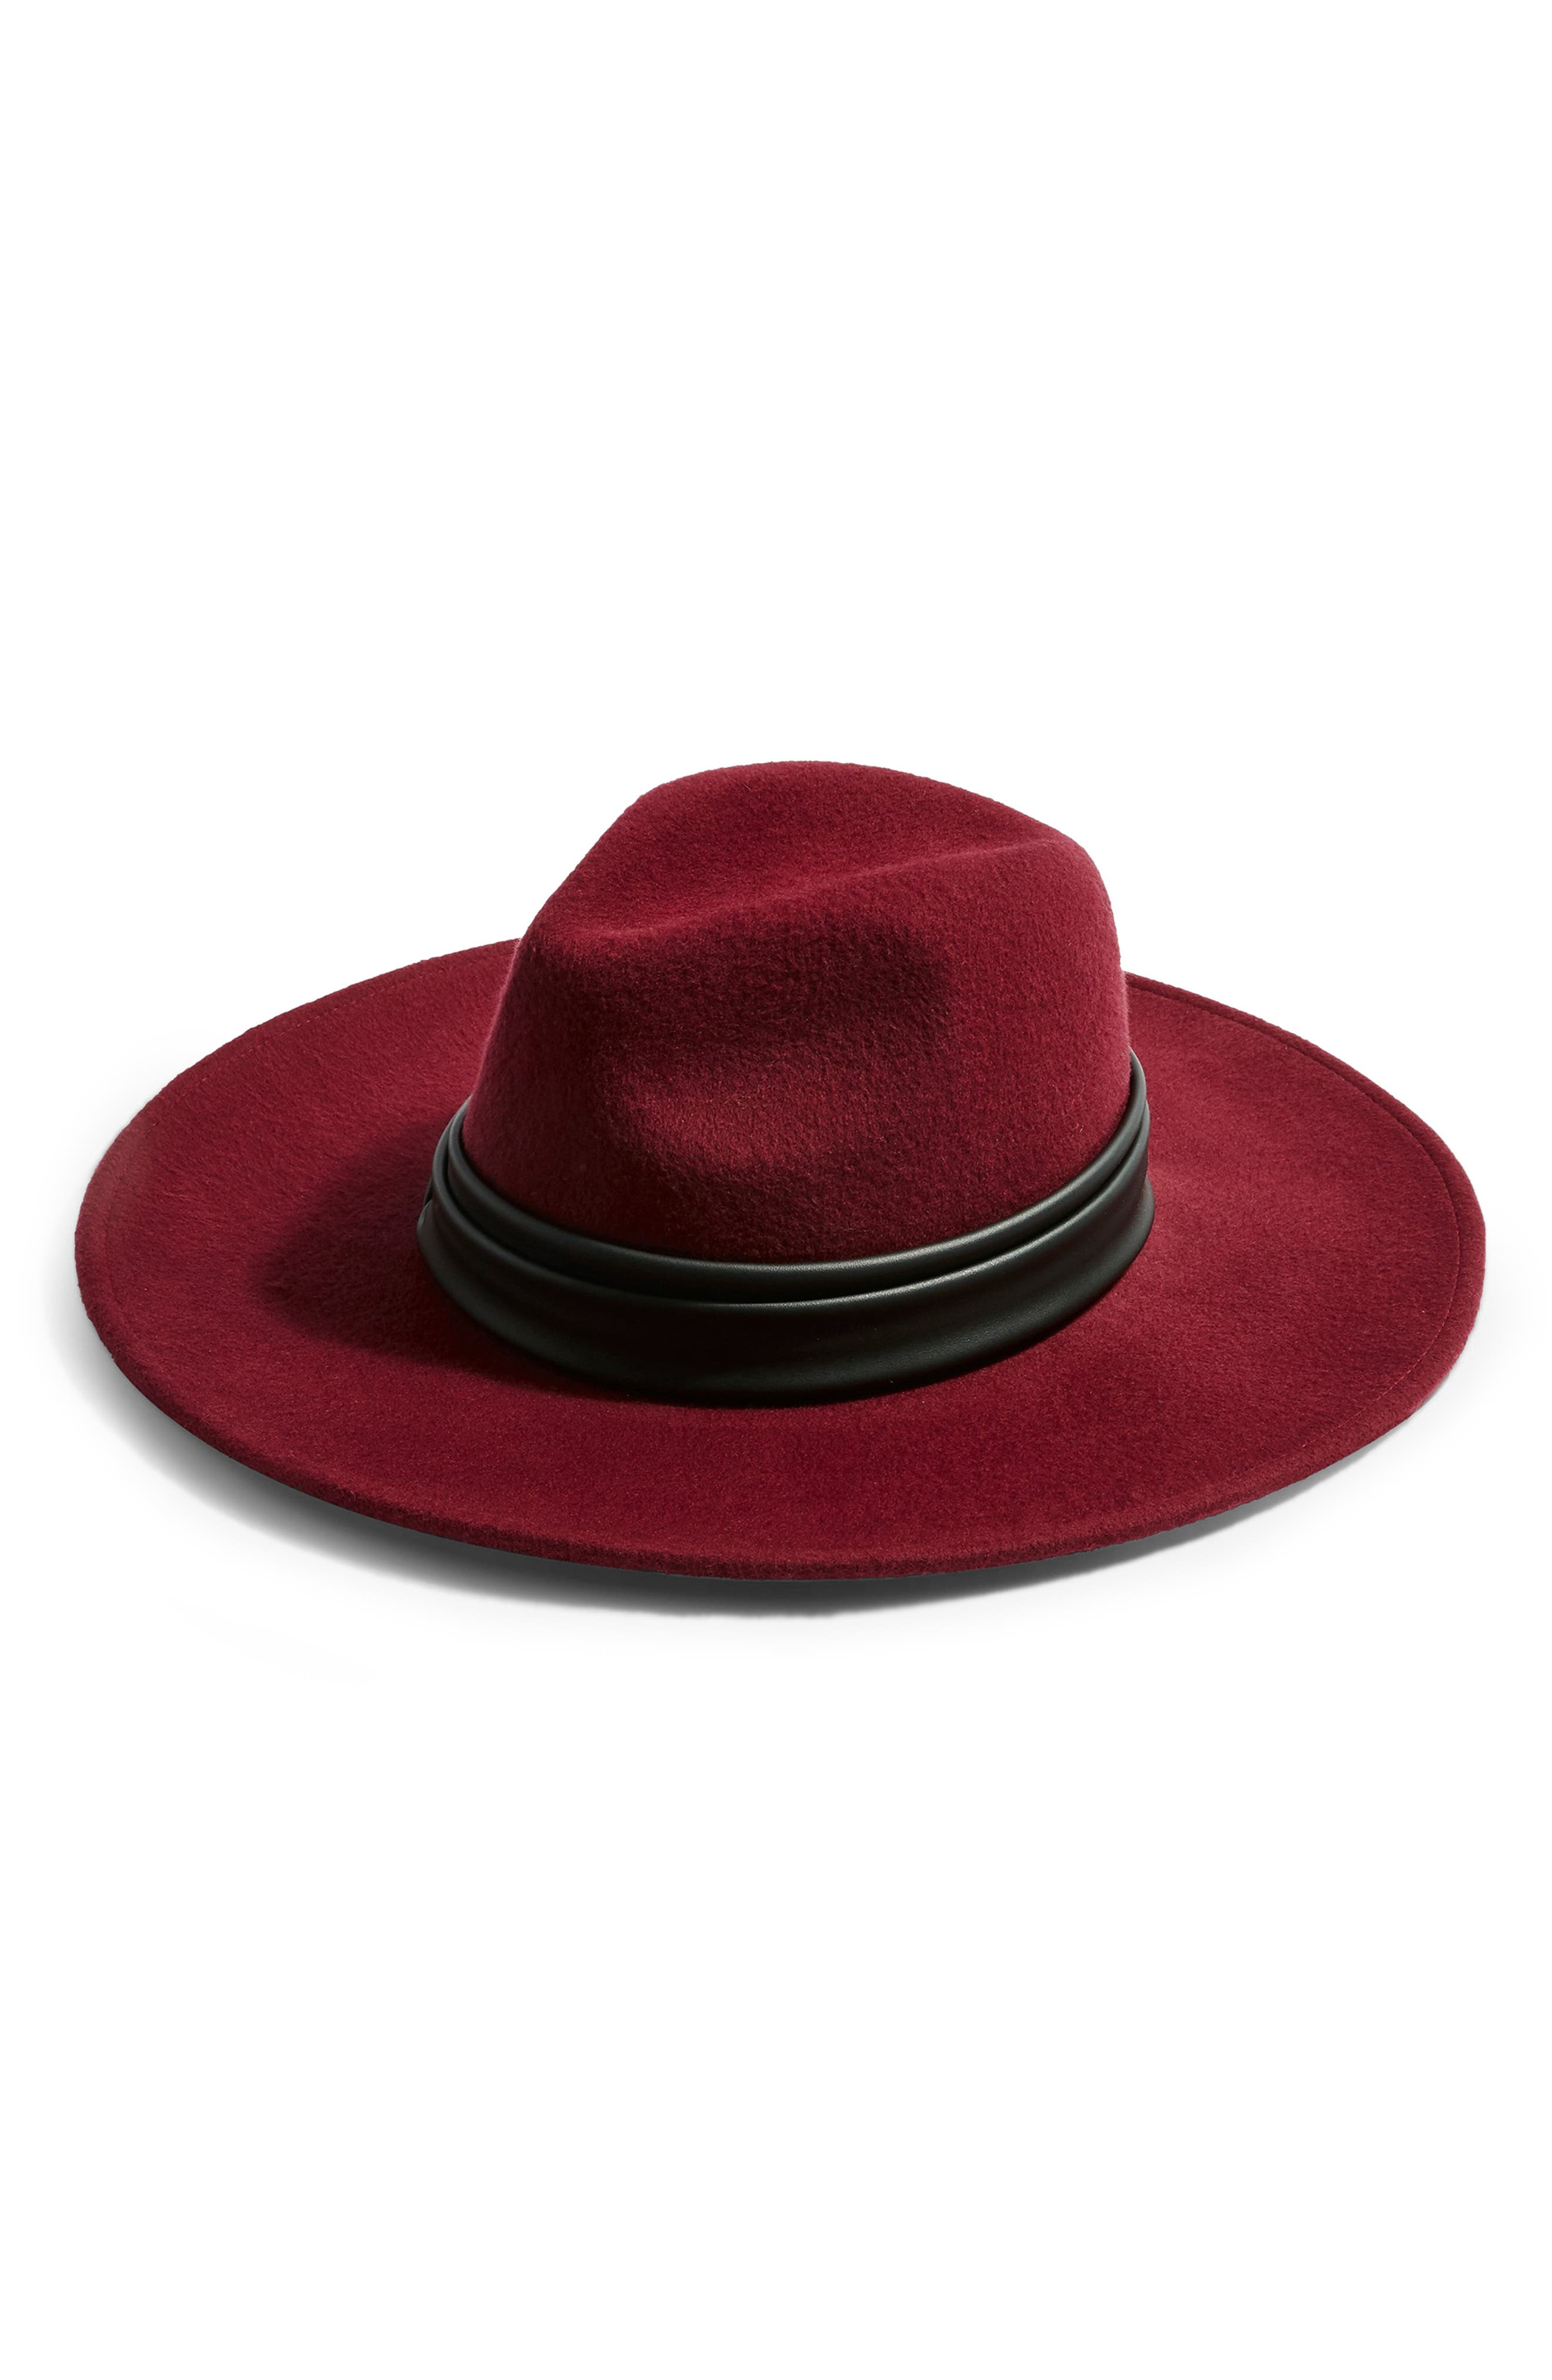 Rockit Wool Felt Panama Hat, Main, color, BURGUNDY MULTI